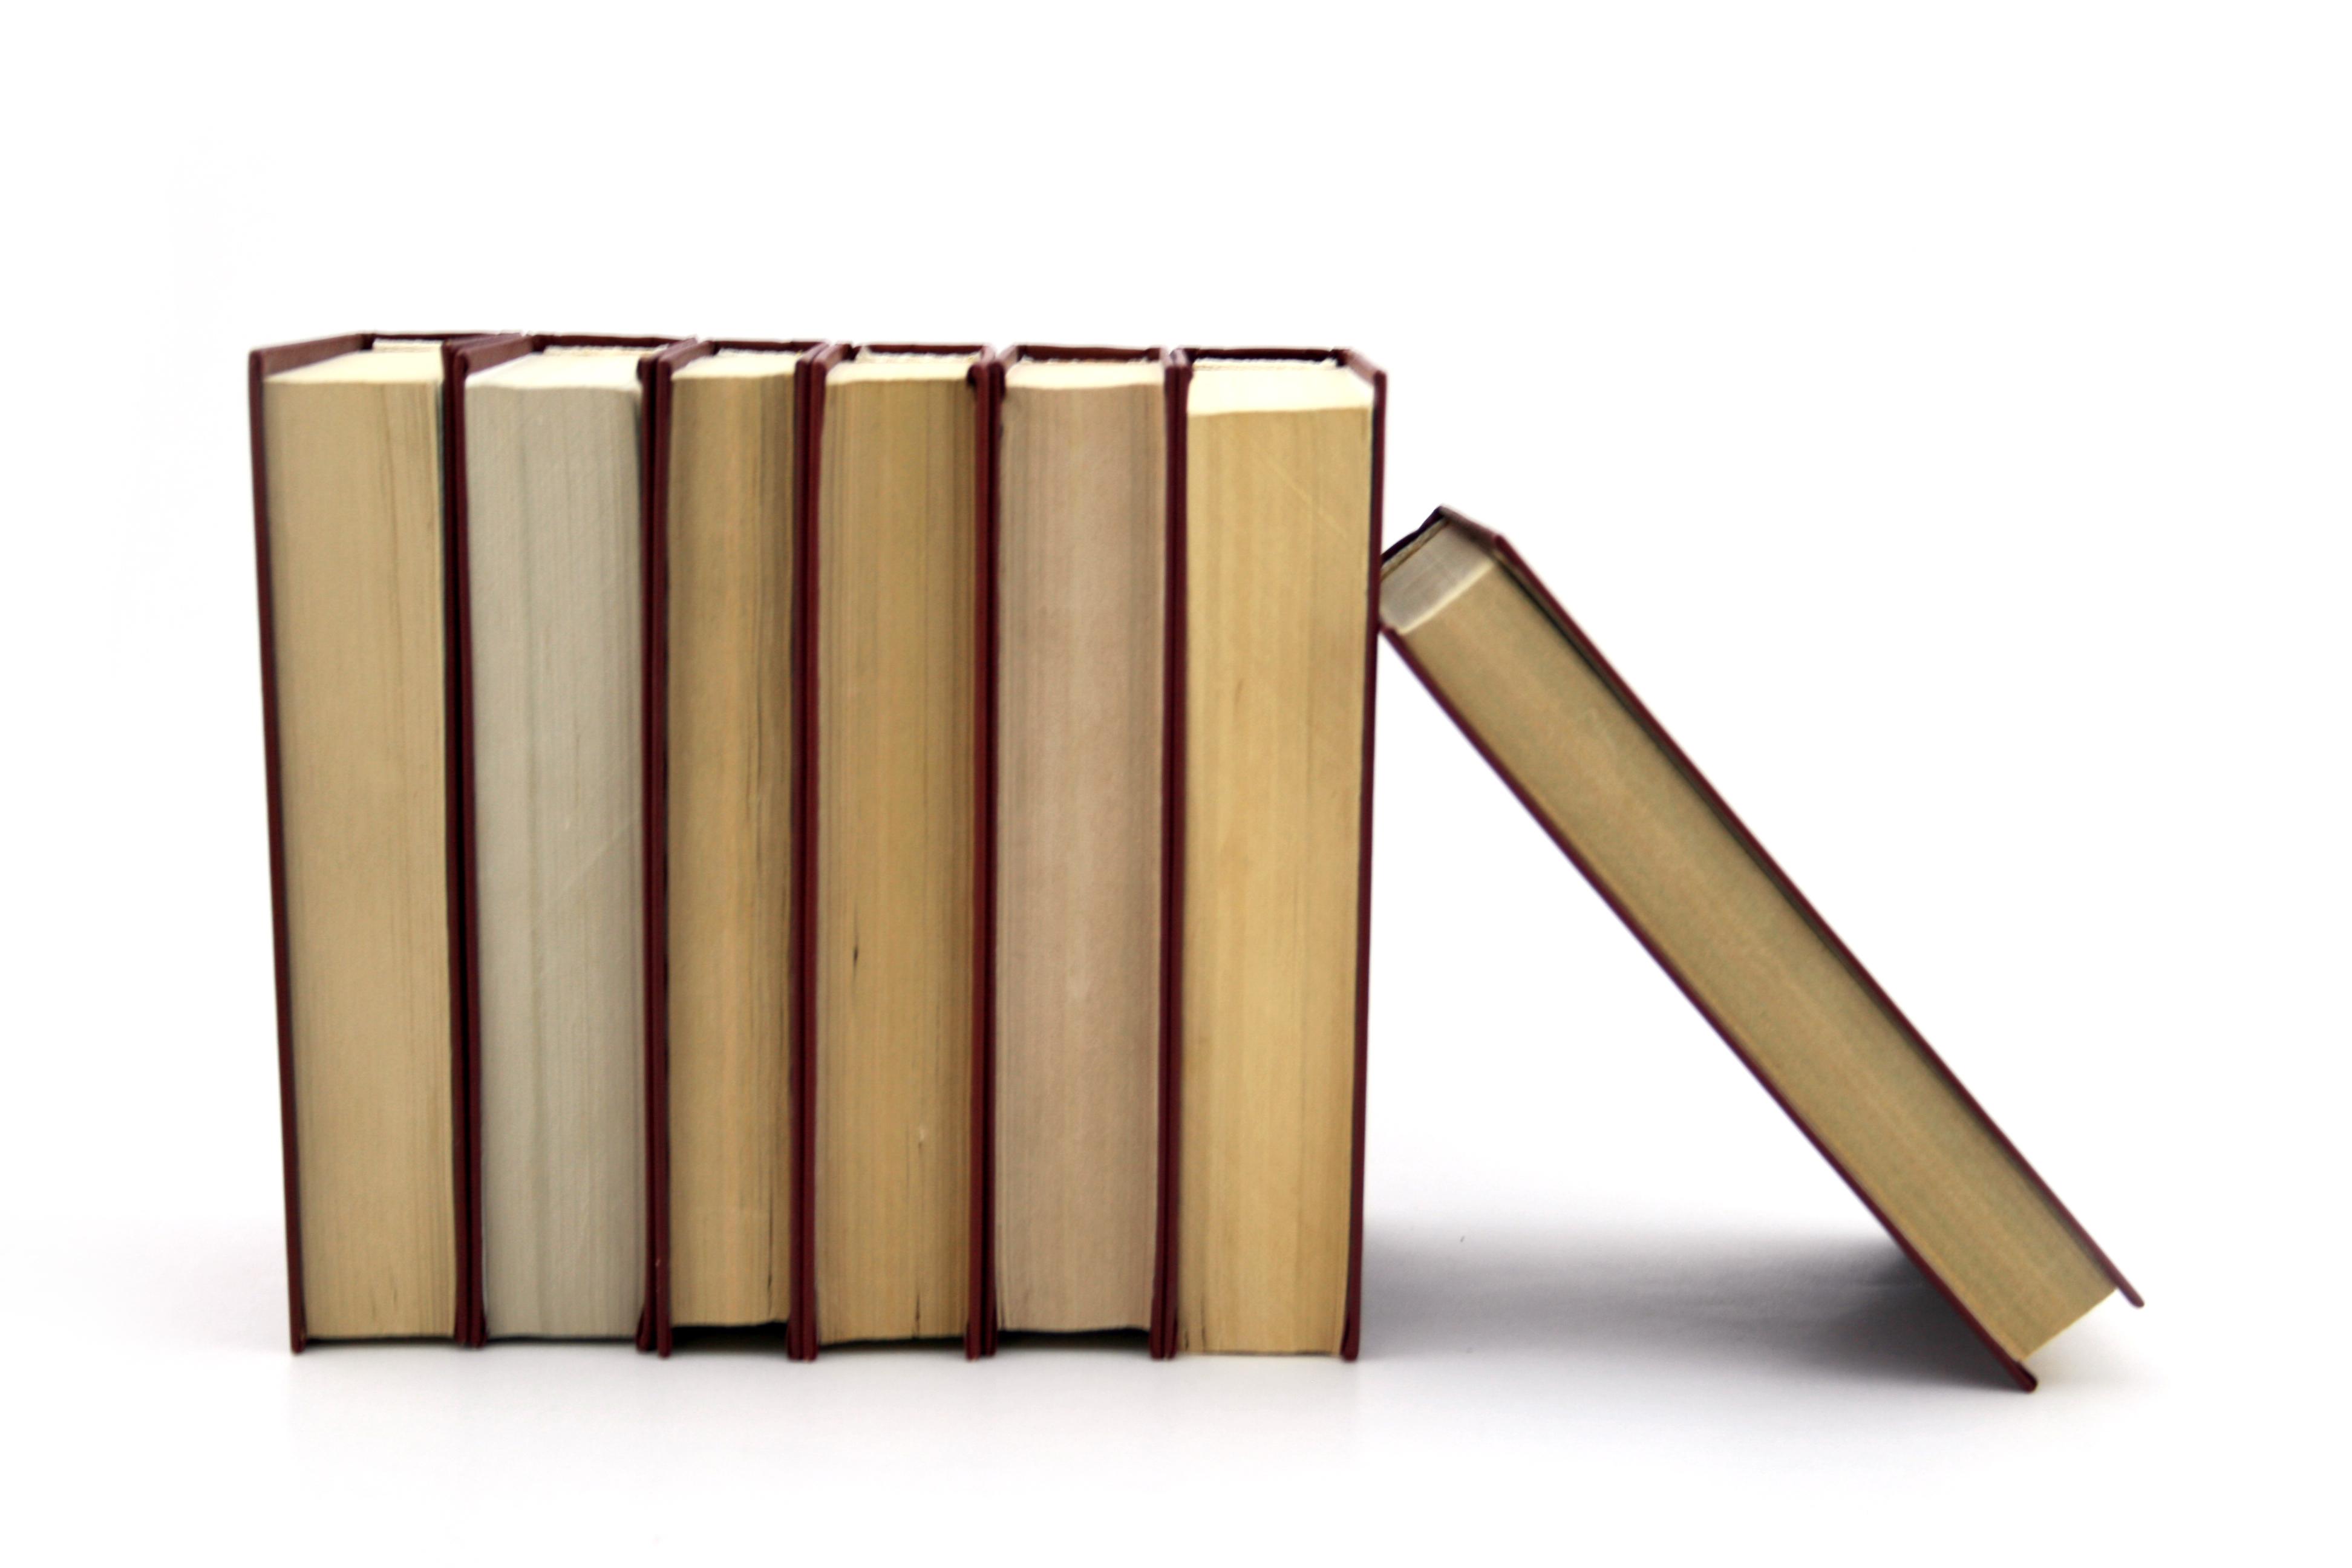 books, Literature, Knowledge, Stack, Textbook, HQ Photo